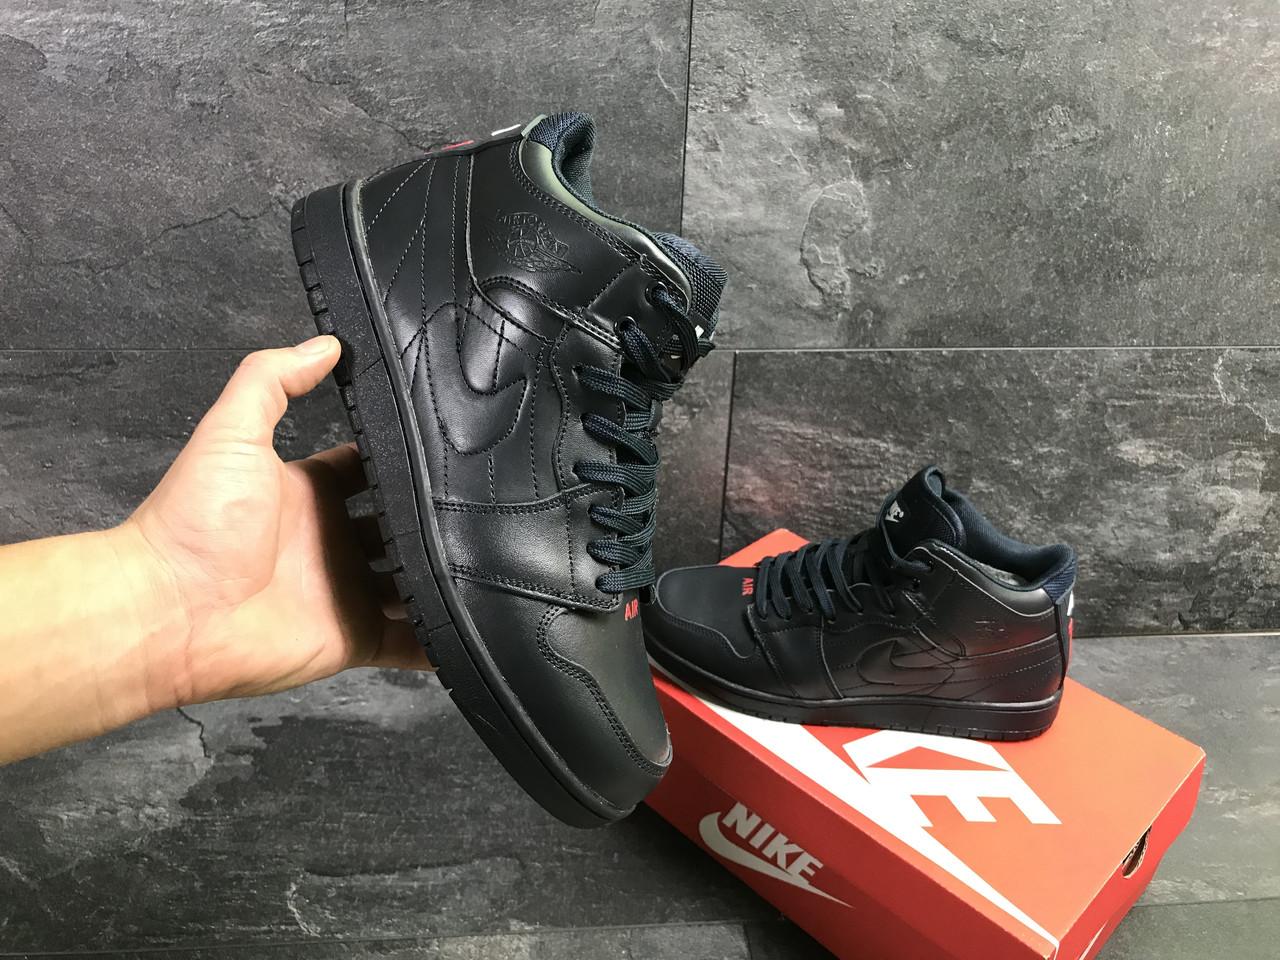 a2e3eefd4ac9 Мужские зимние кроссовки Nike Air Jordan синие ( реплика ААА+) ...